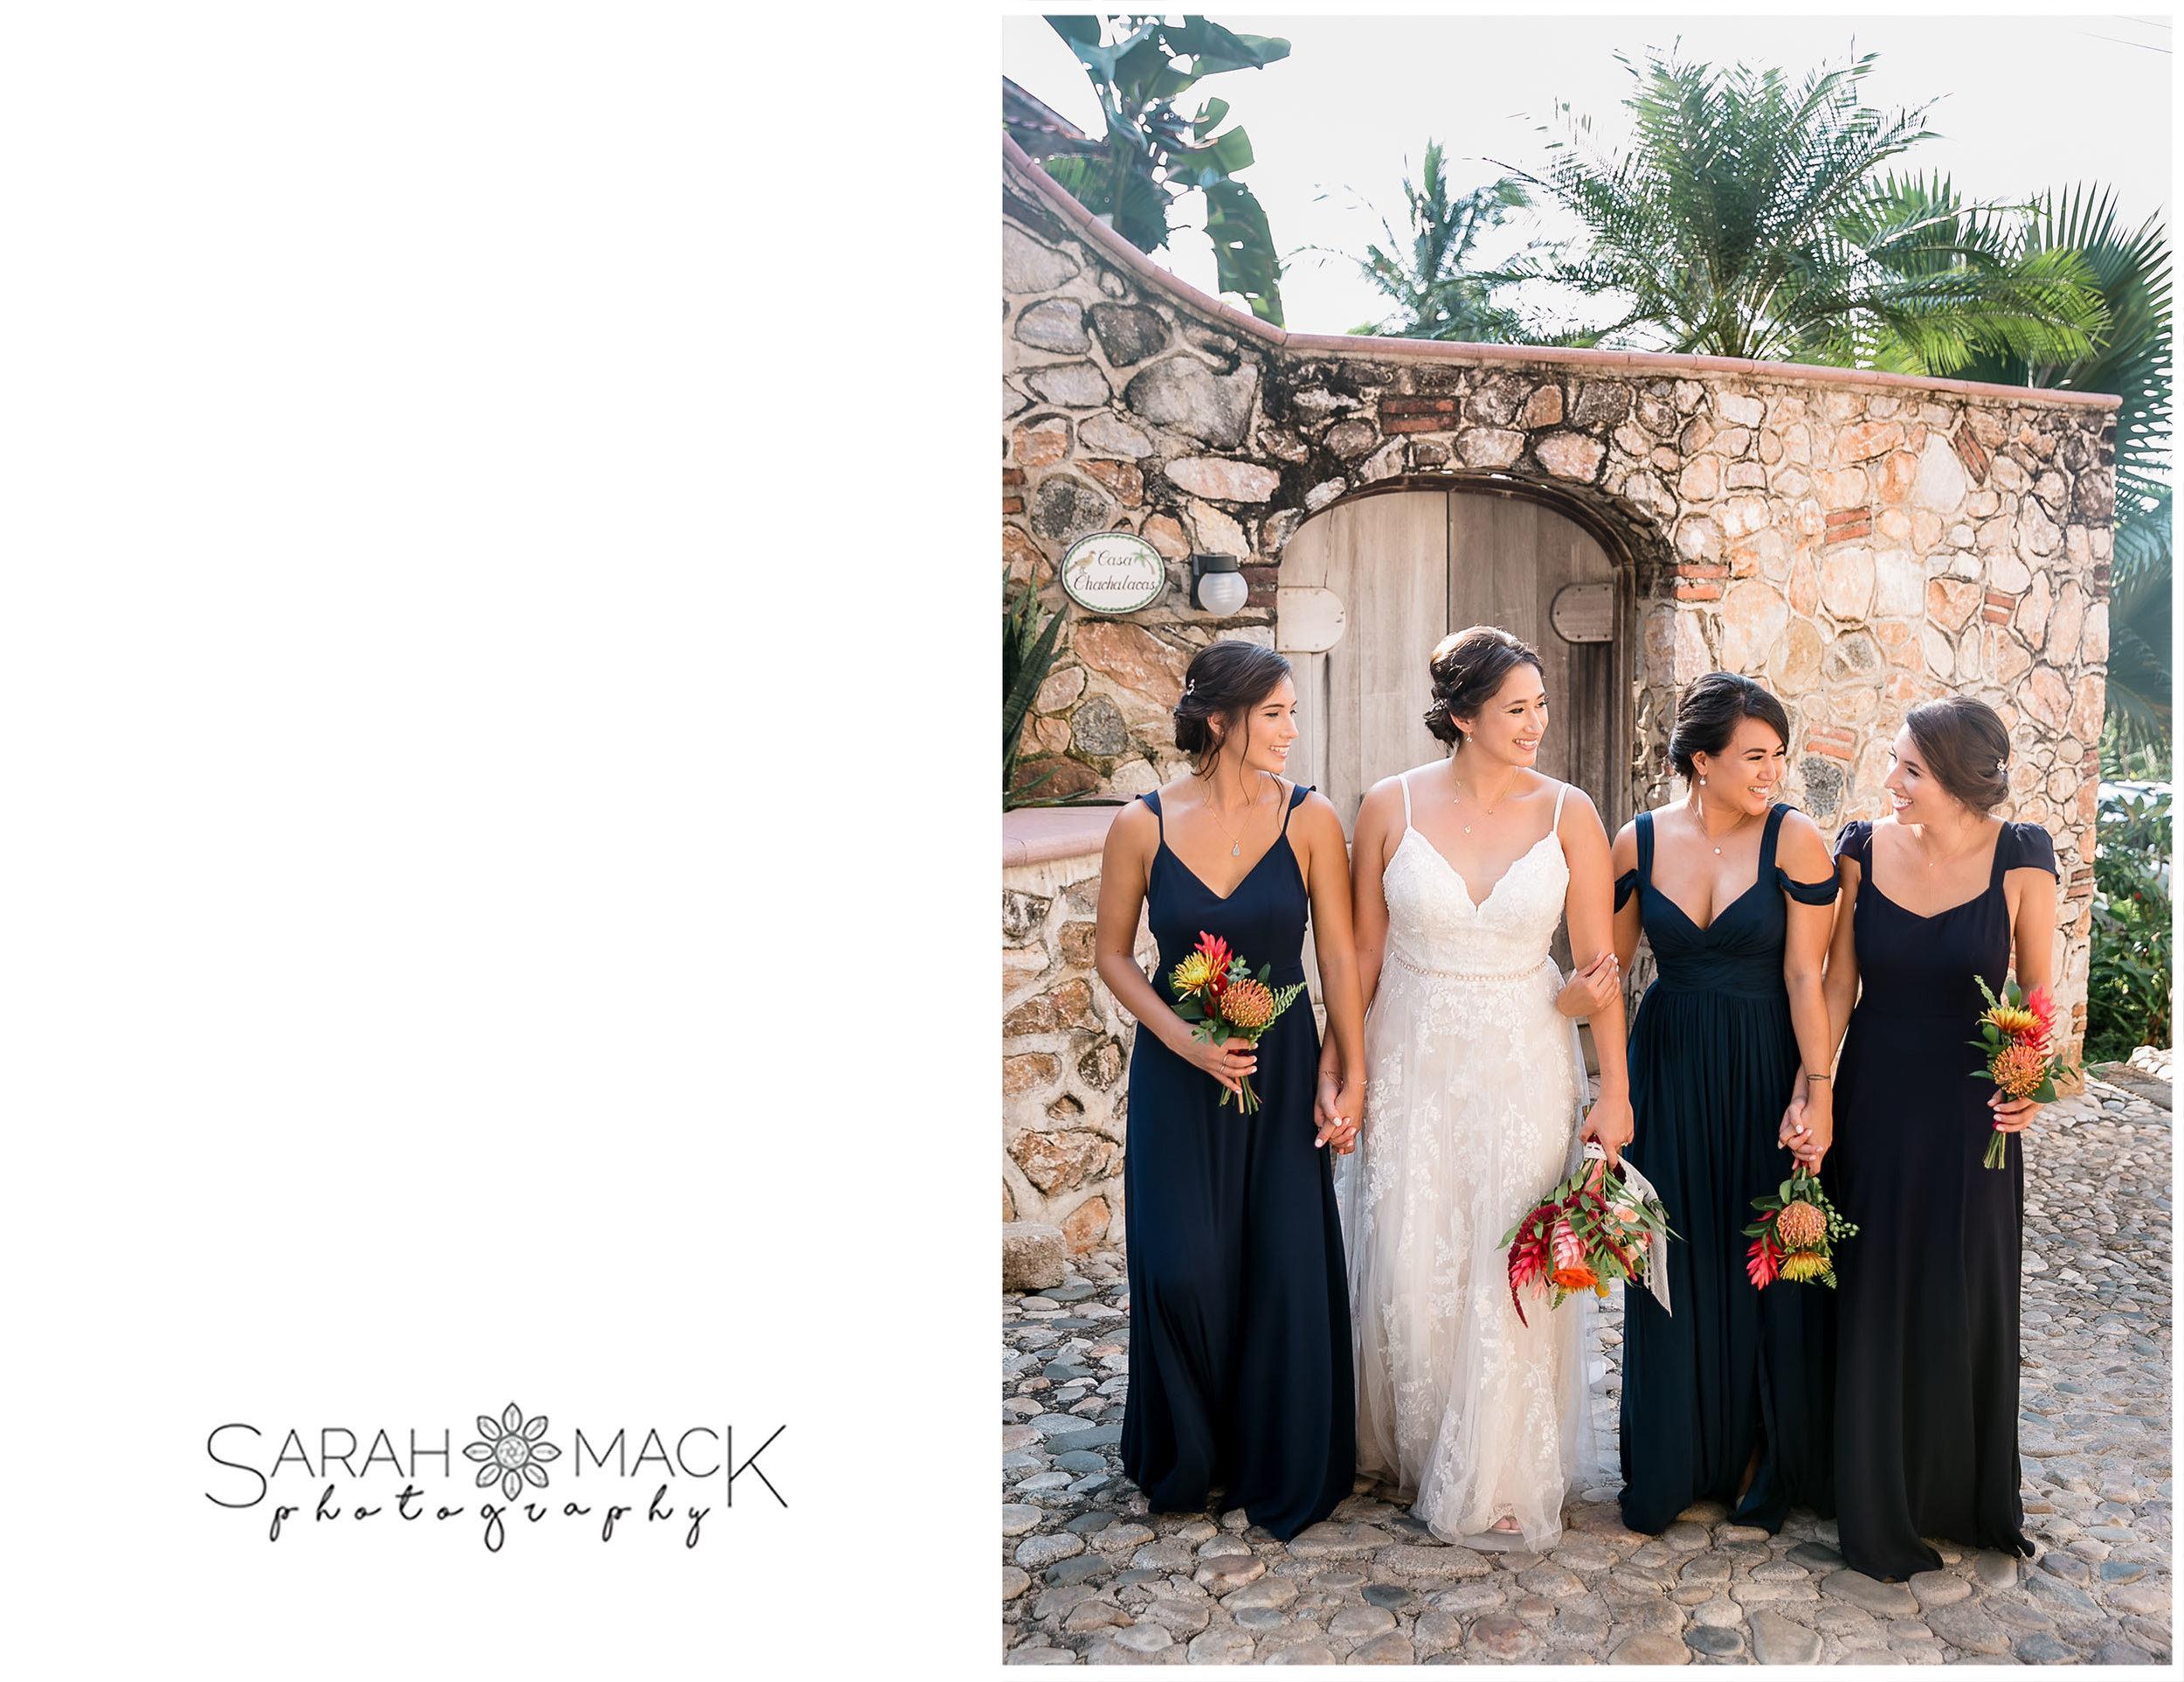 ES-Flor-de-Playa-Sayulita-Wedding-Photography-27.jpg